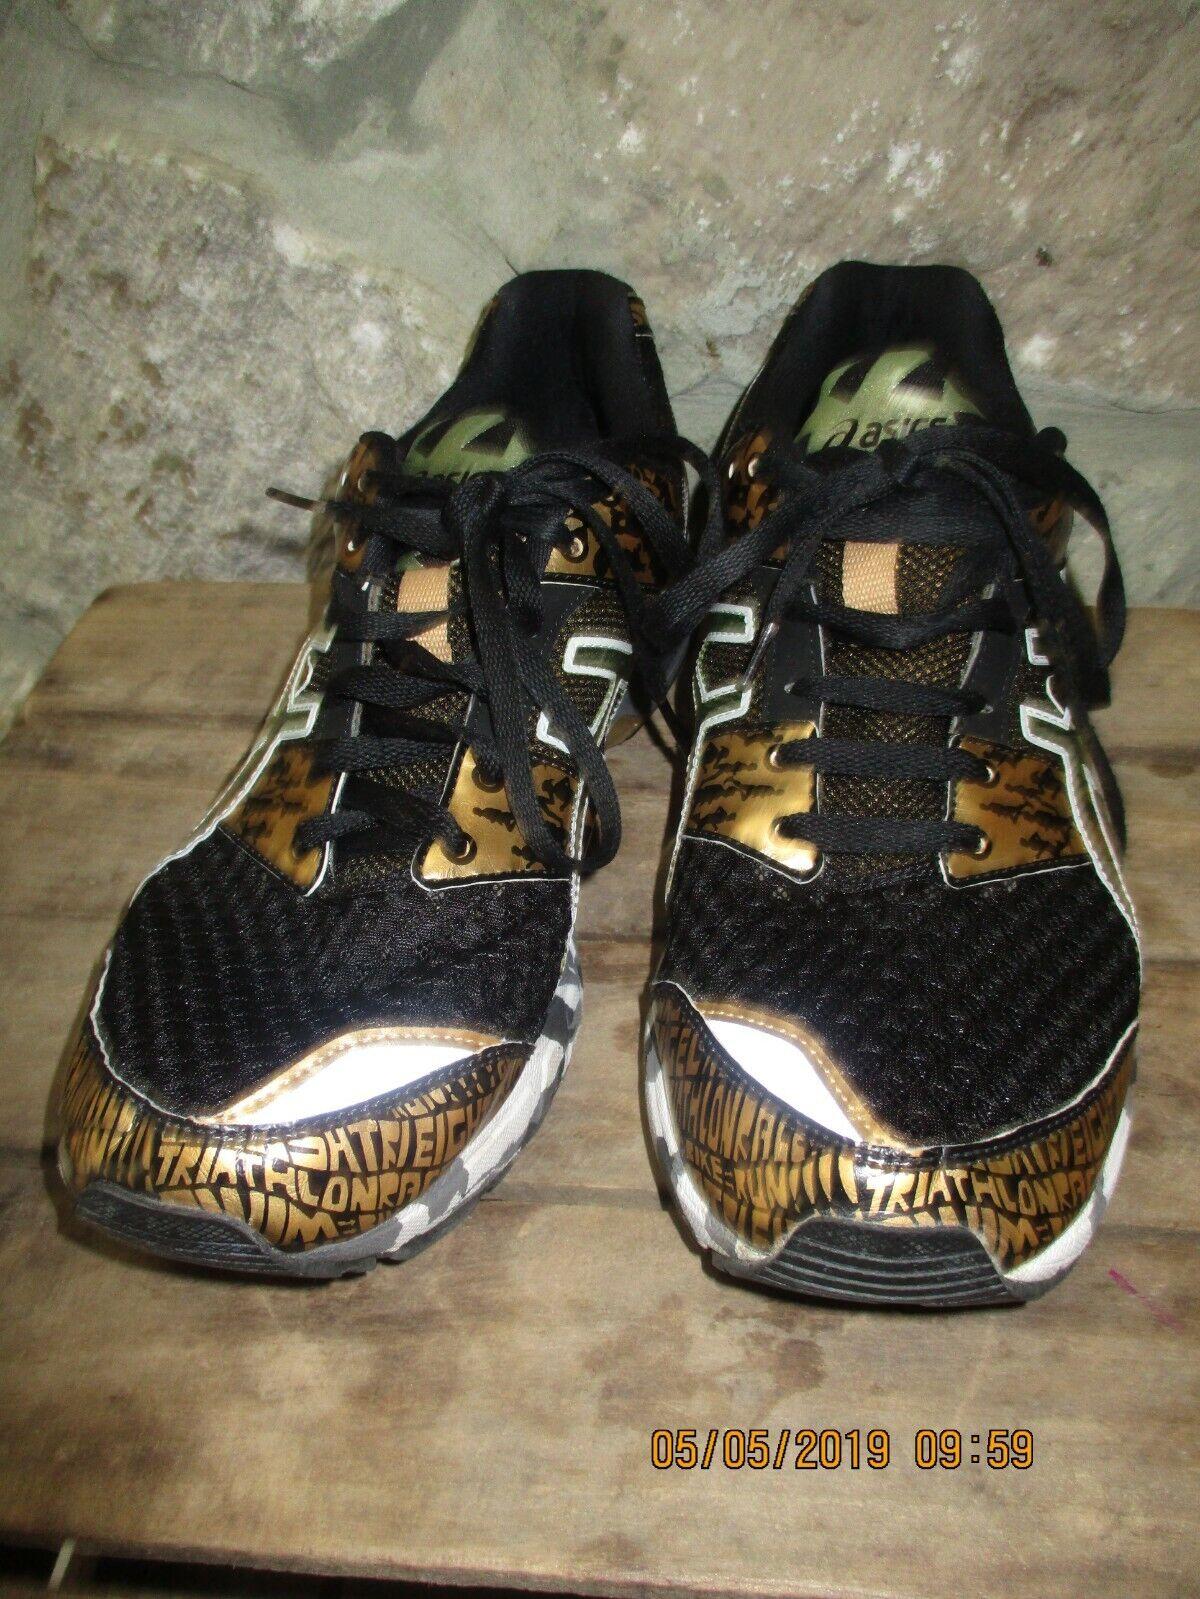 Mens Asics Gel Noosa Tri 8 T3S3N Dorado Negro Zapato de correr TALLA 12 Raro Difícil de encontrar Estilo CE